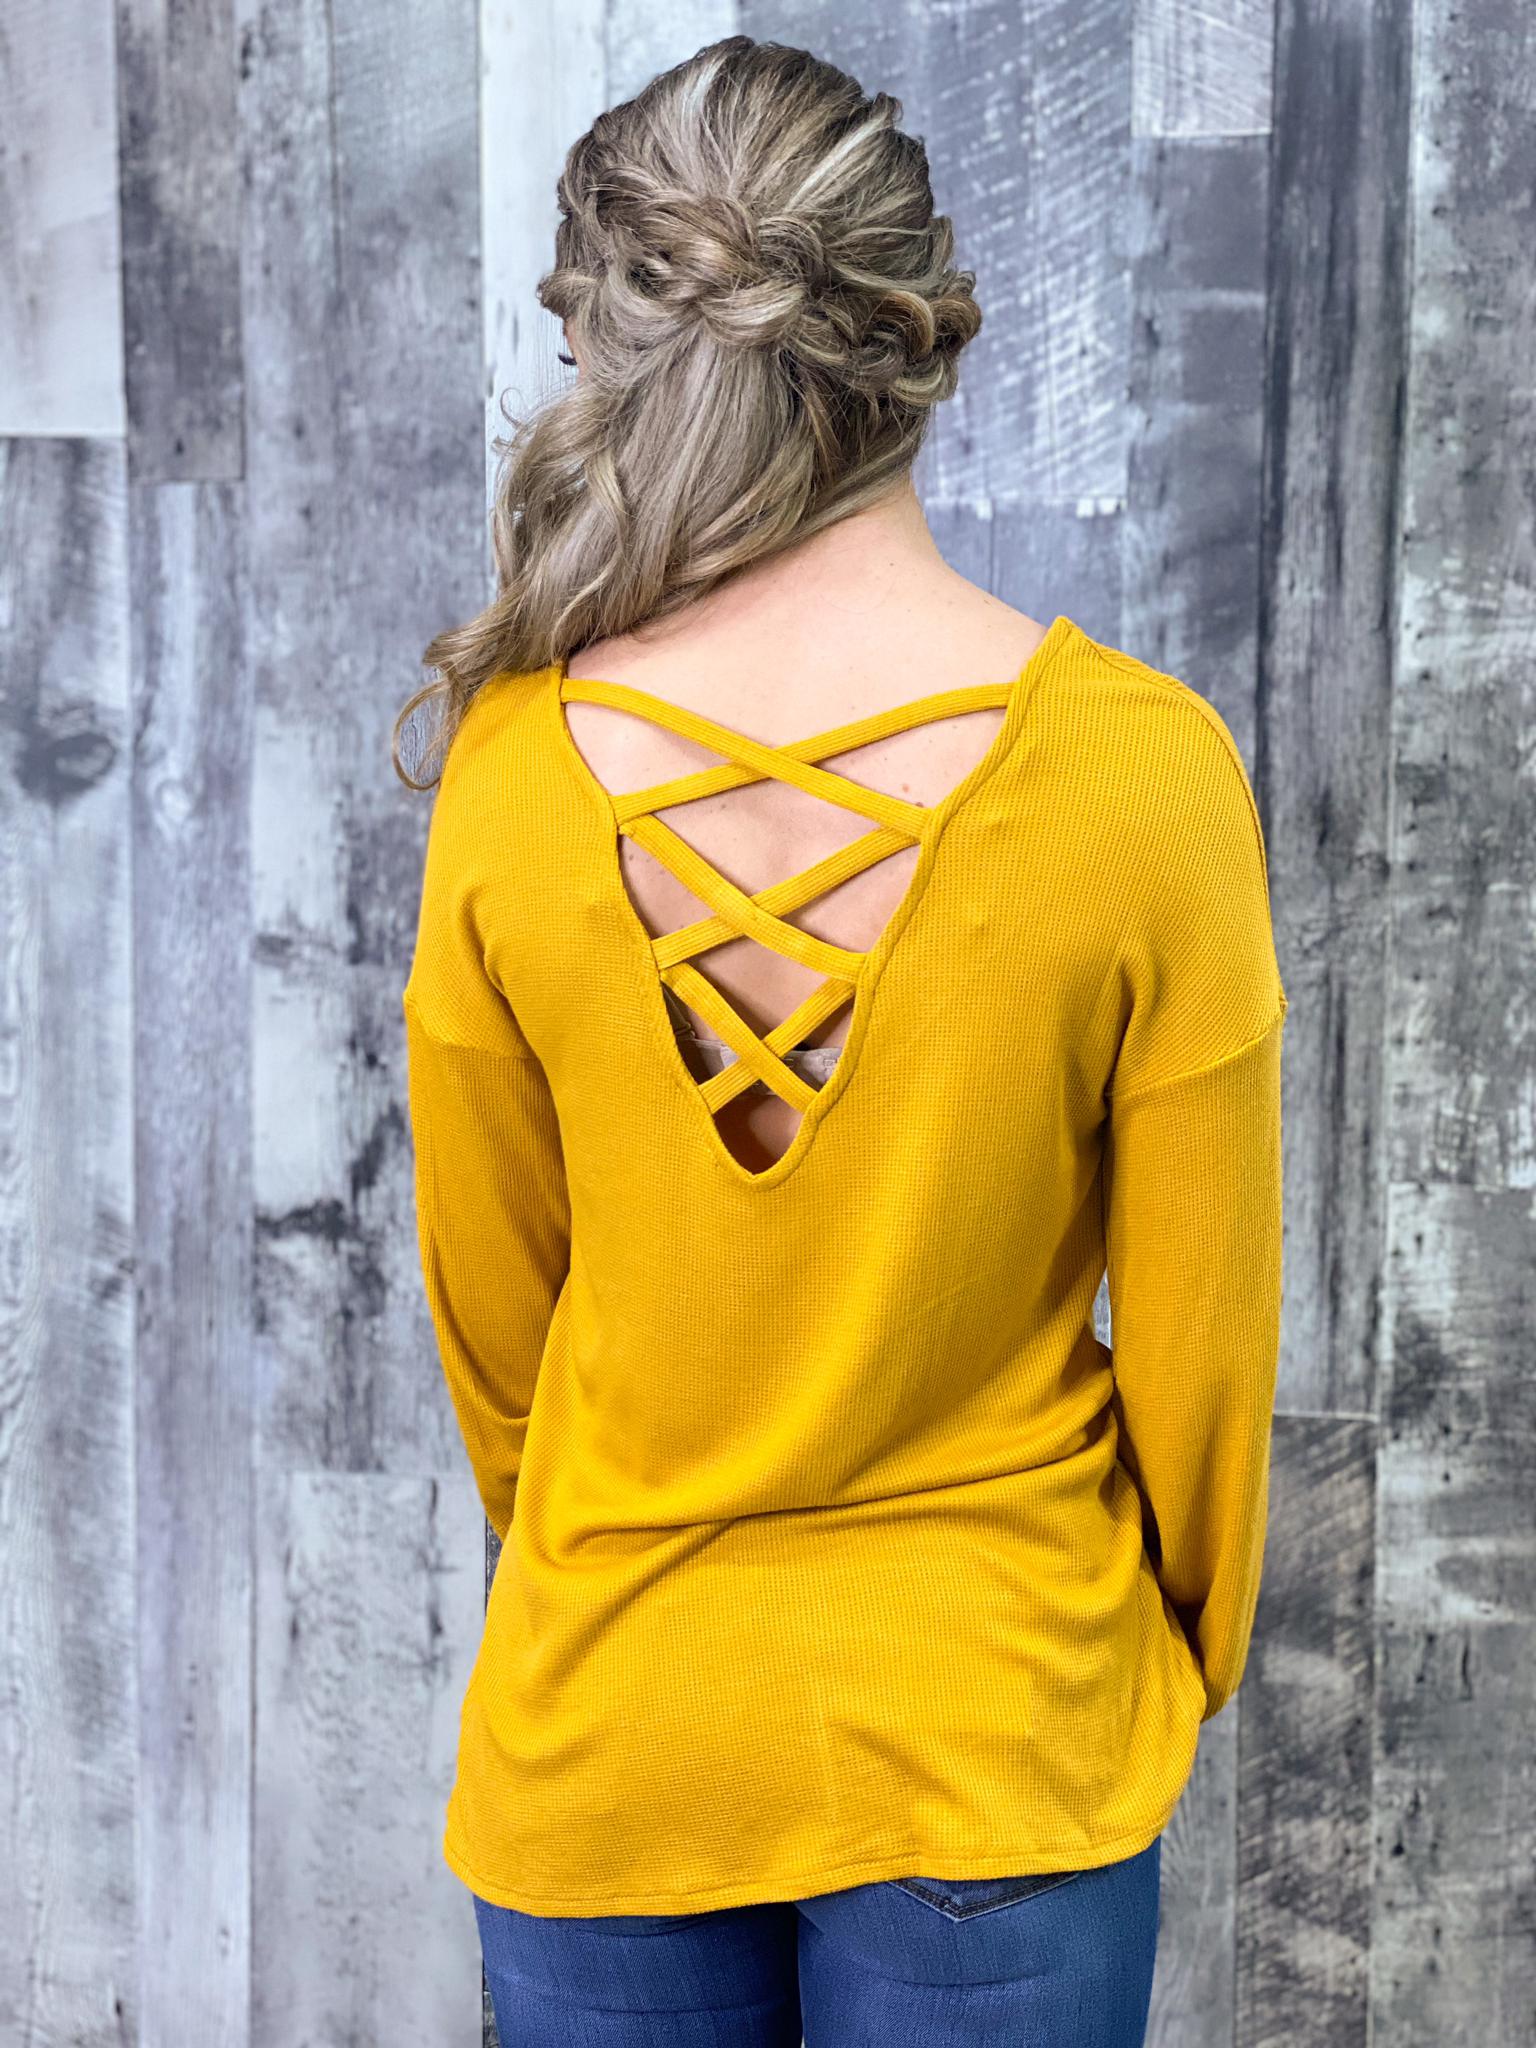 Criss Cross Back Long Sleeve Top - Mustard